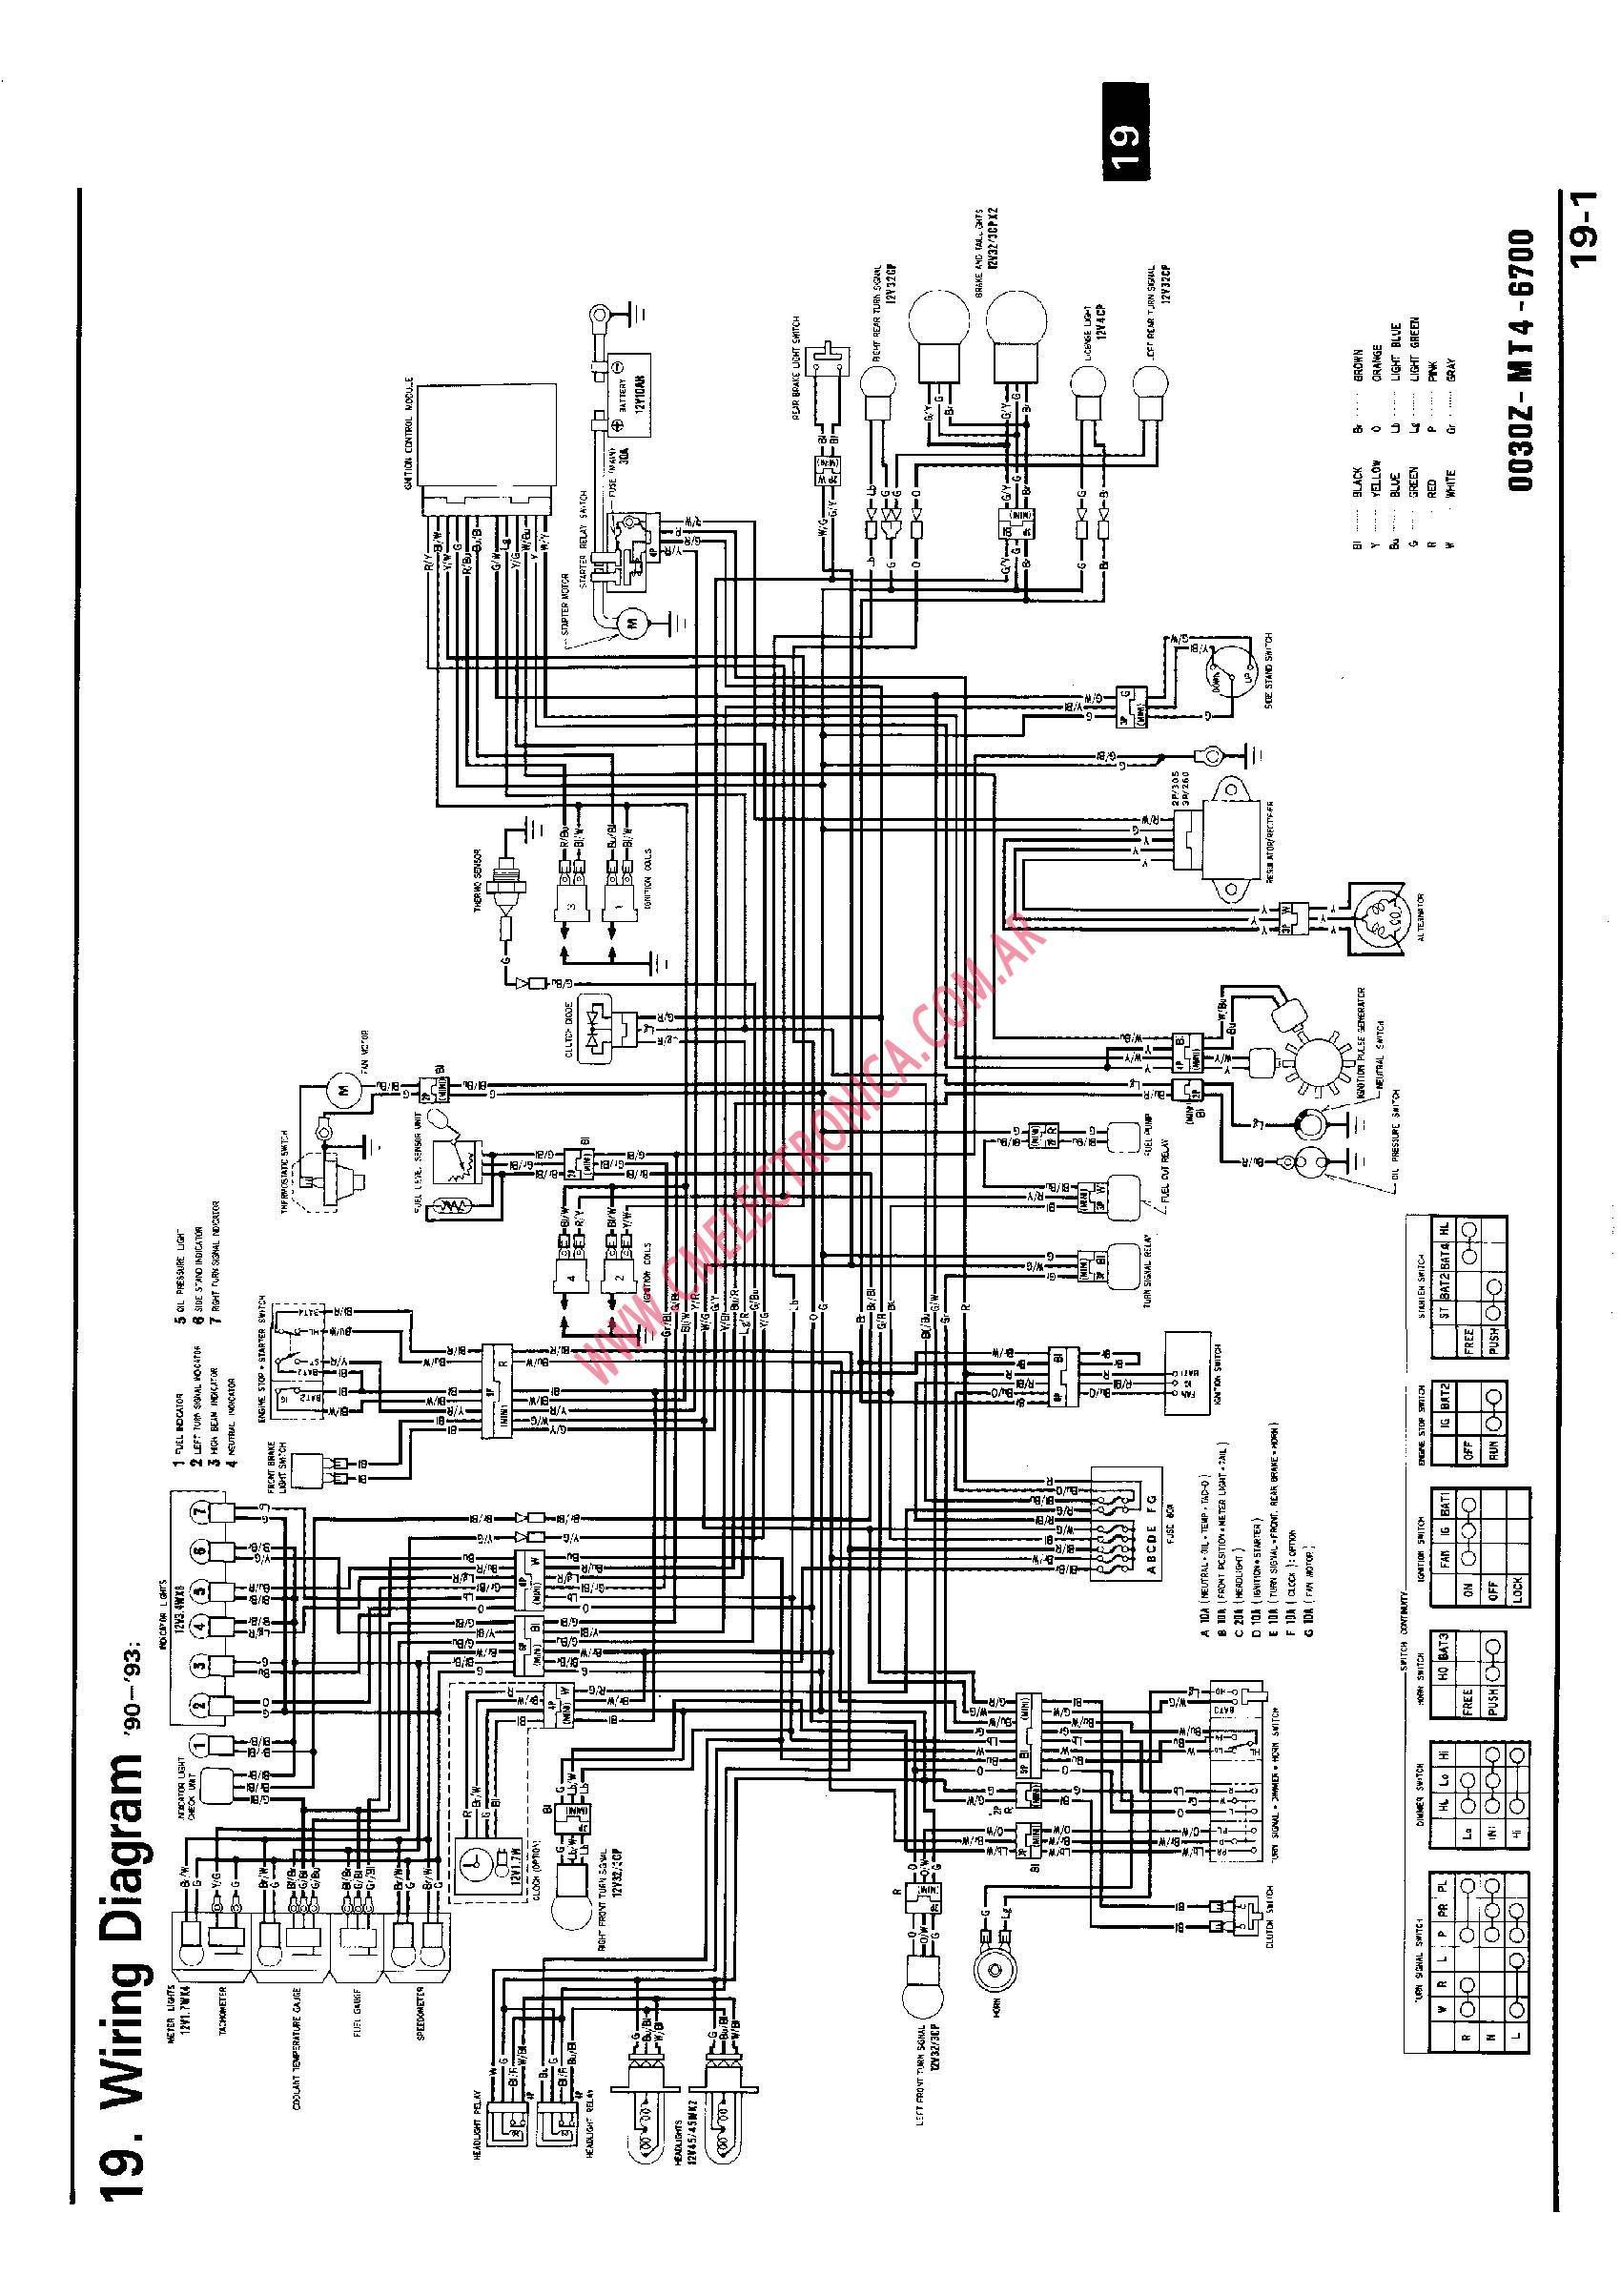 Honda Vfr Wiring Diagram - ghirardellimarco.it device-slant -  device-slant.ghirardellimarco.itghirardellimarco.it